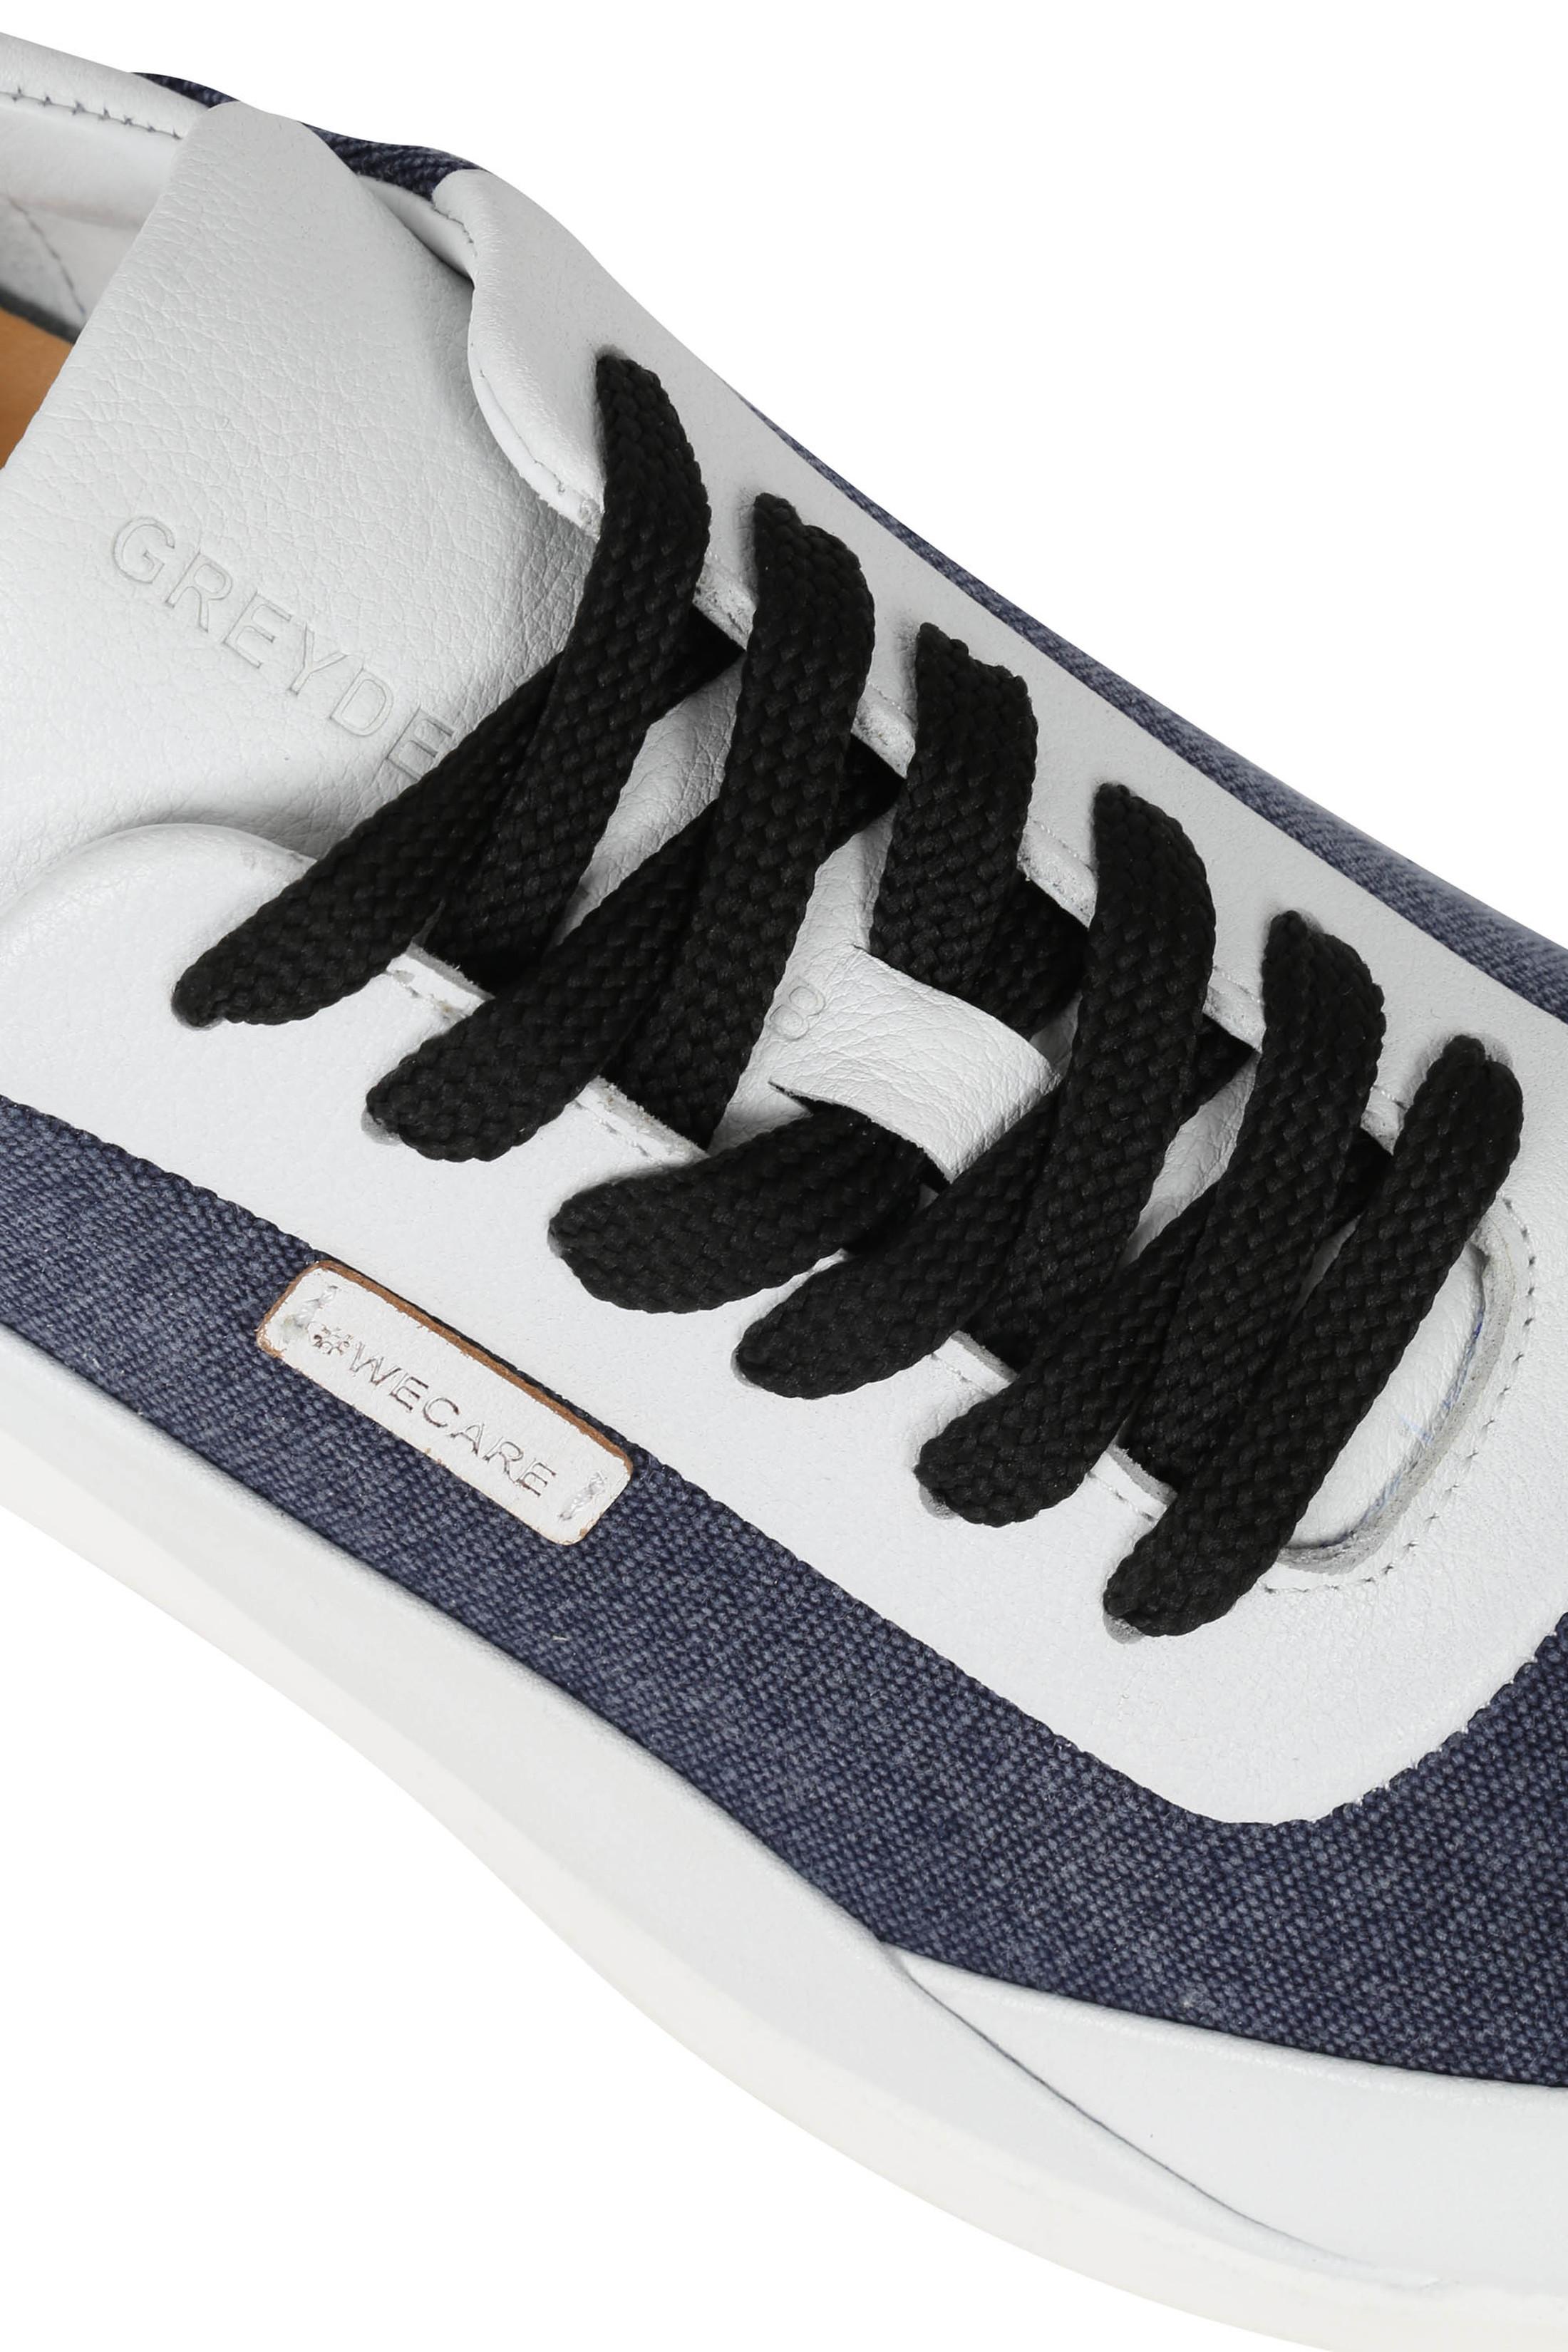 Greyder Lab Sneaker GL-212-31 Blauw